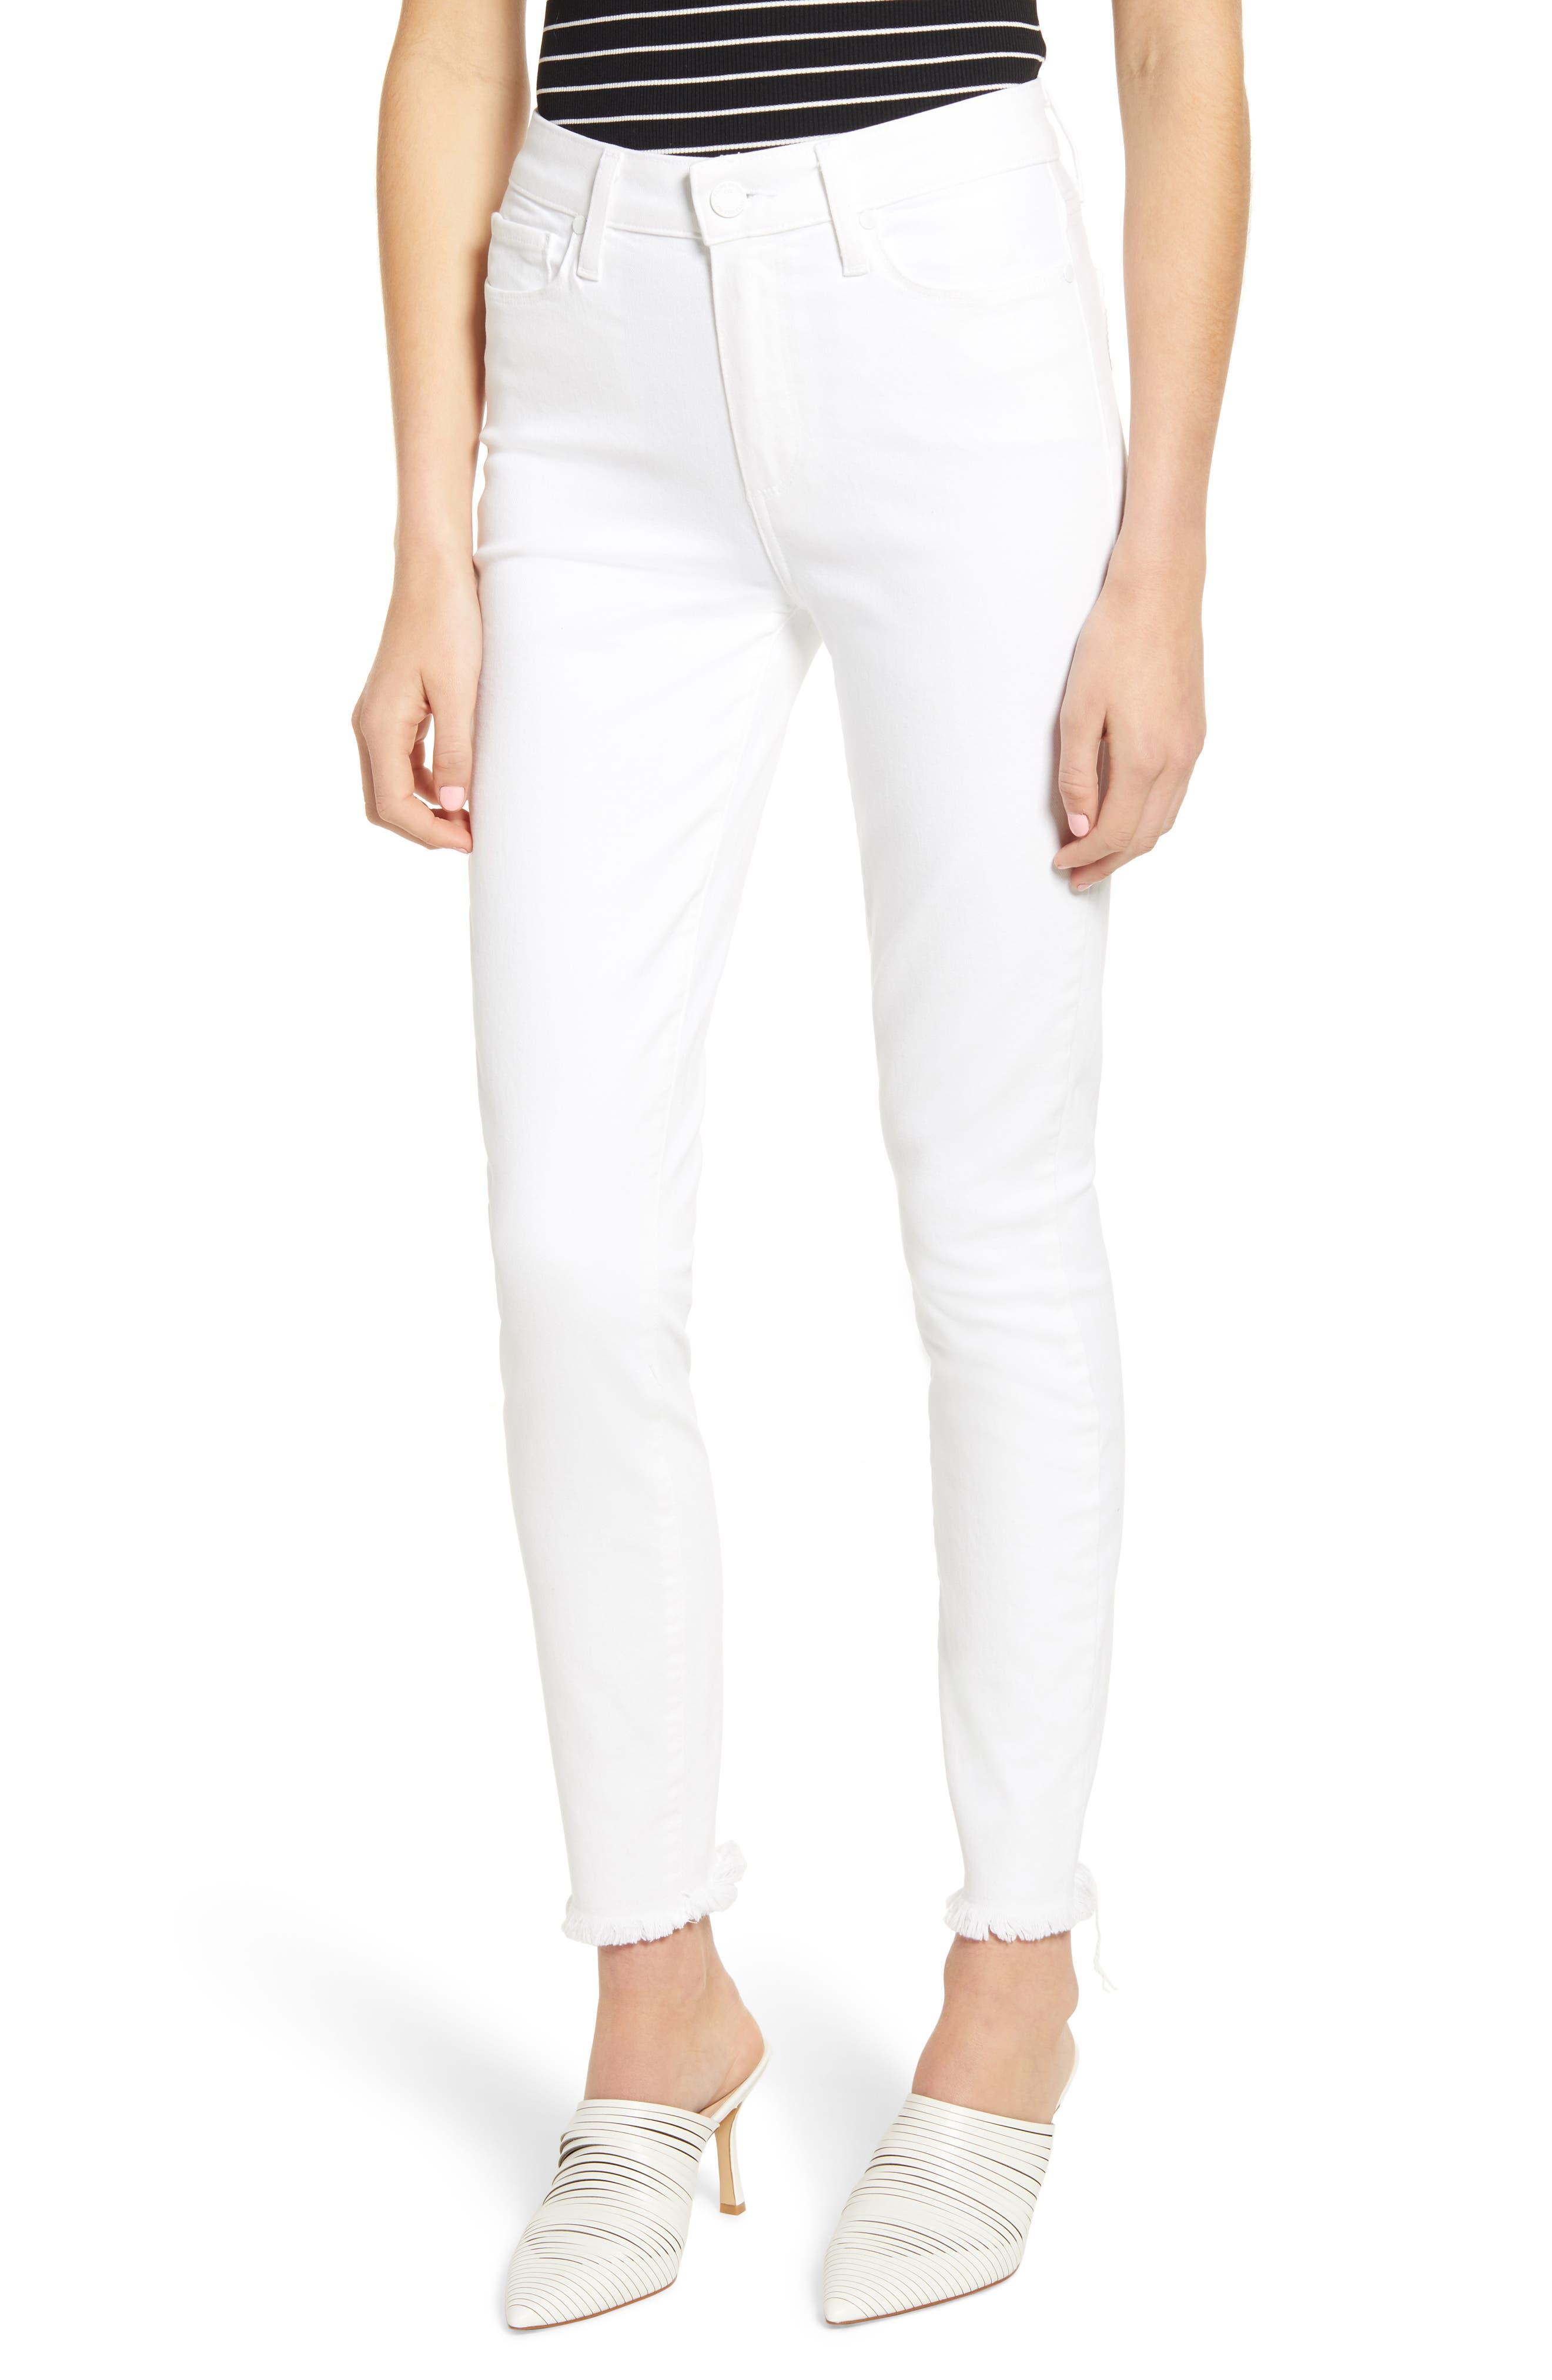 PAIGE, Hoxton High Waist Ankle Skinny Jeans, Main thumbnail 1, color, CRISP WHITE